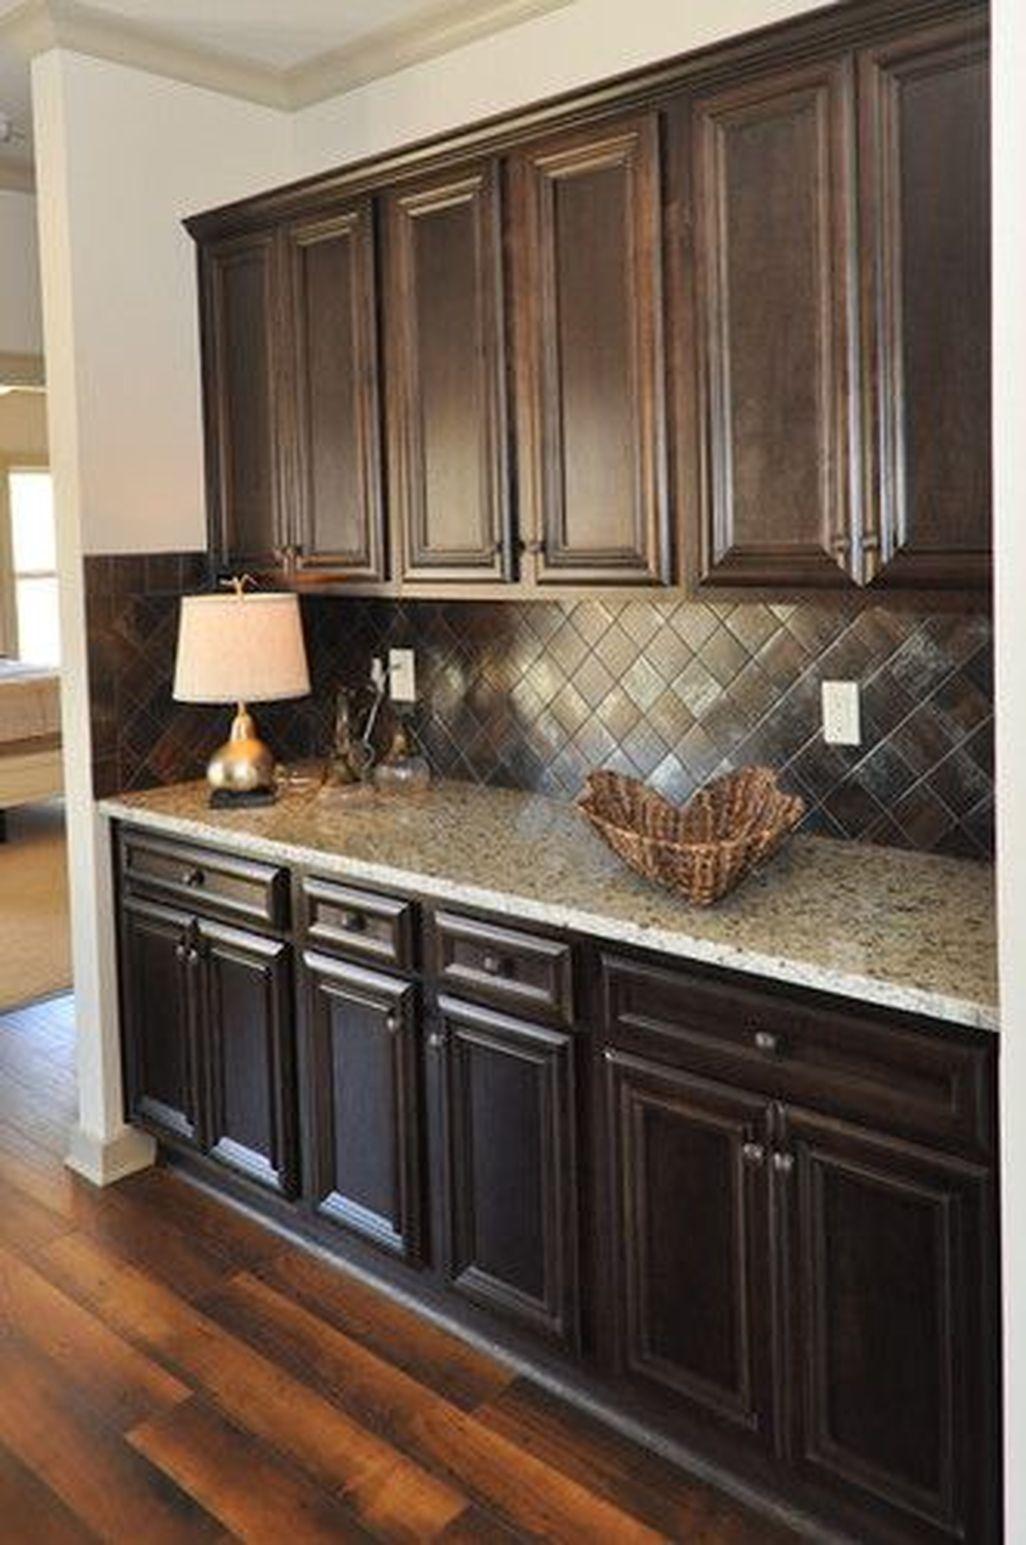 48 Stunning Dark Wood Floor Ideas Kitchen kitchen #48 # ... on Backsplash Ideas For Dark Cabinets And Dark Countertops  id=97479